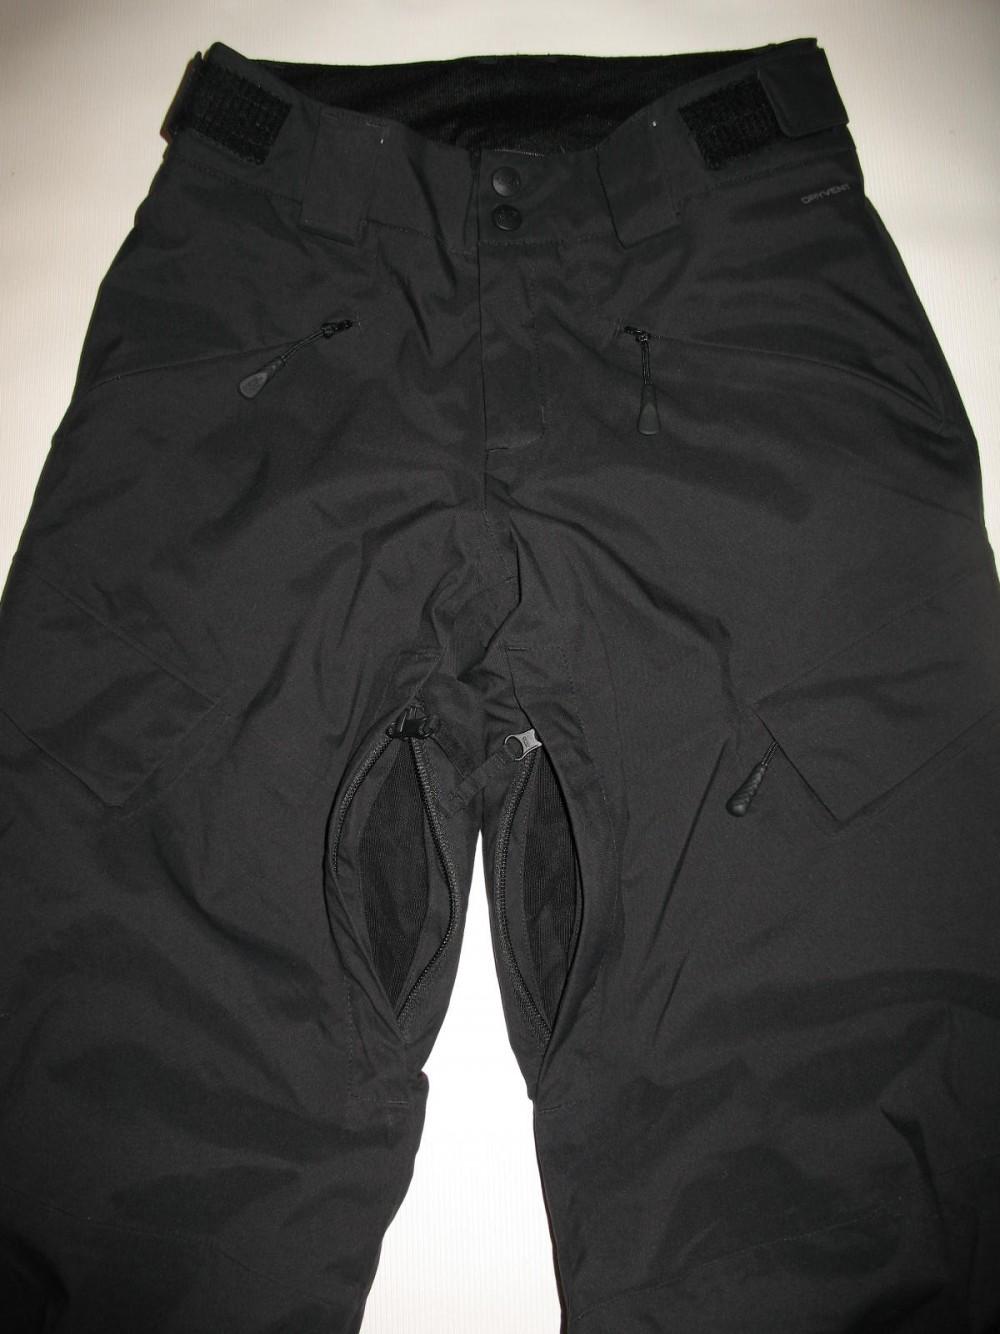 Штаны THE NORTH FACE gatekeeper pants lady (размер XS) - 6